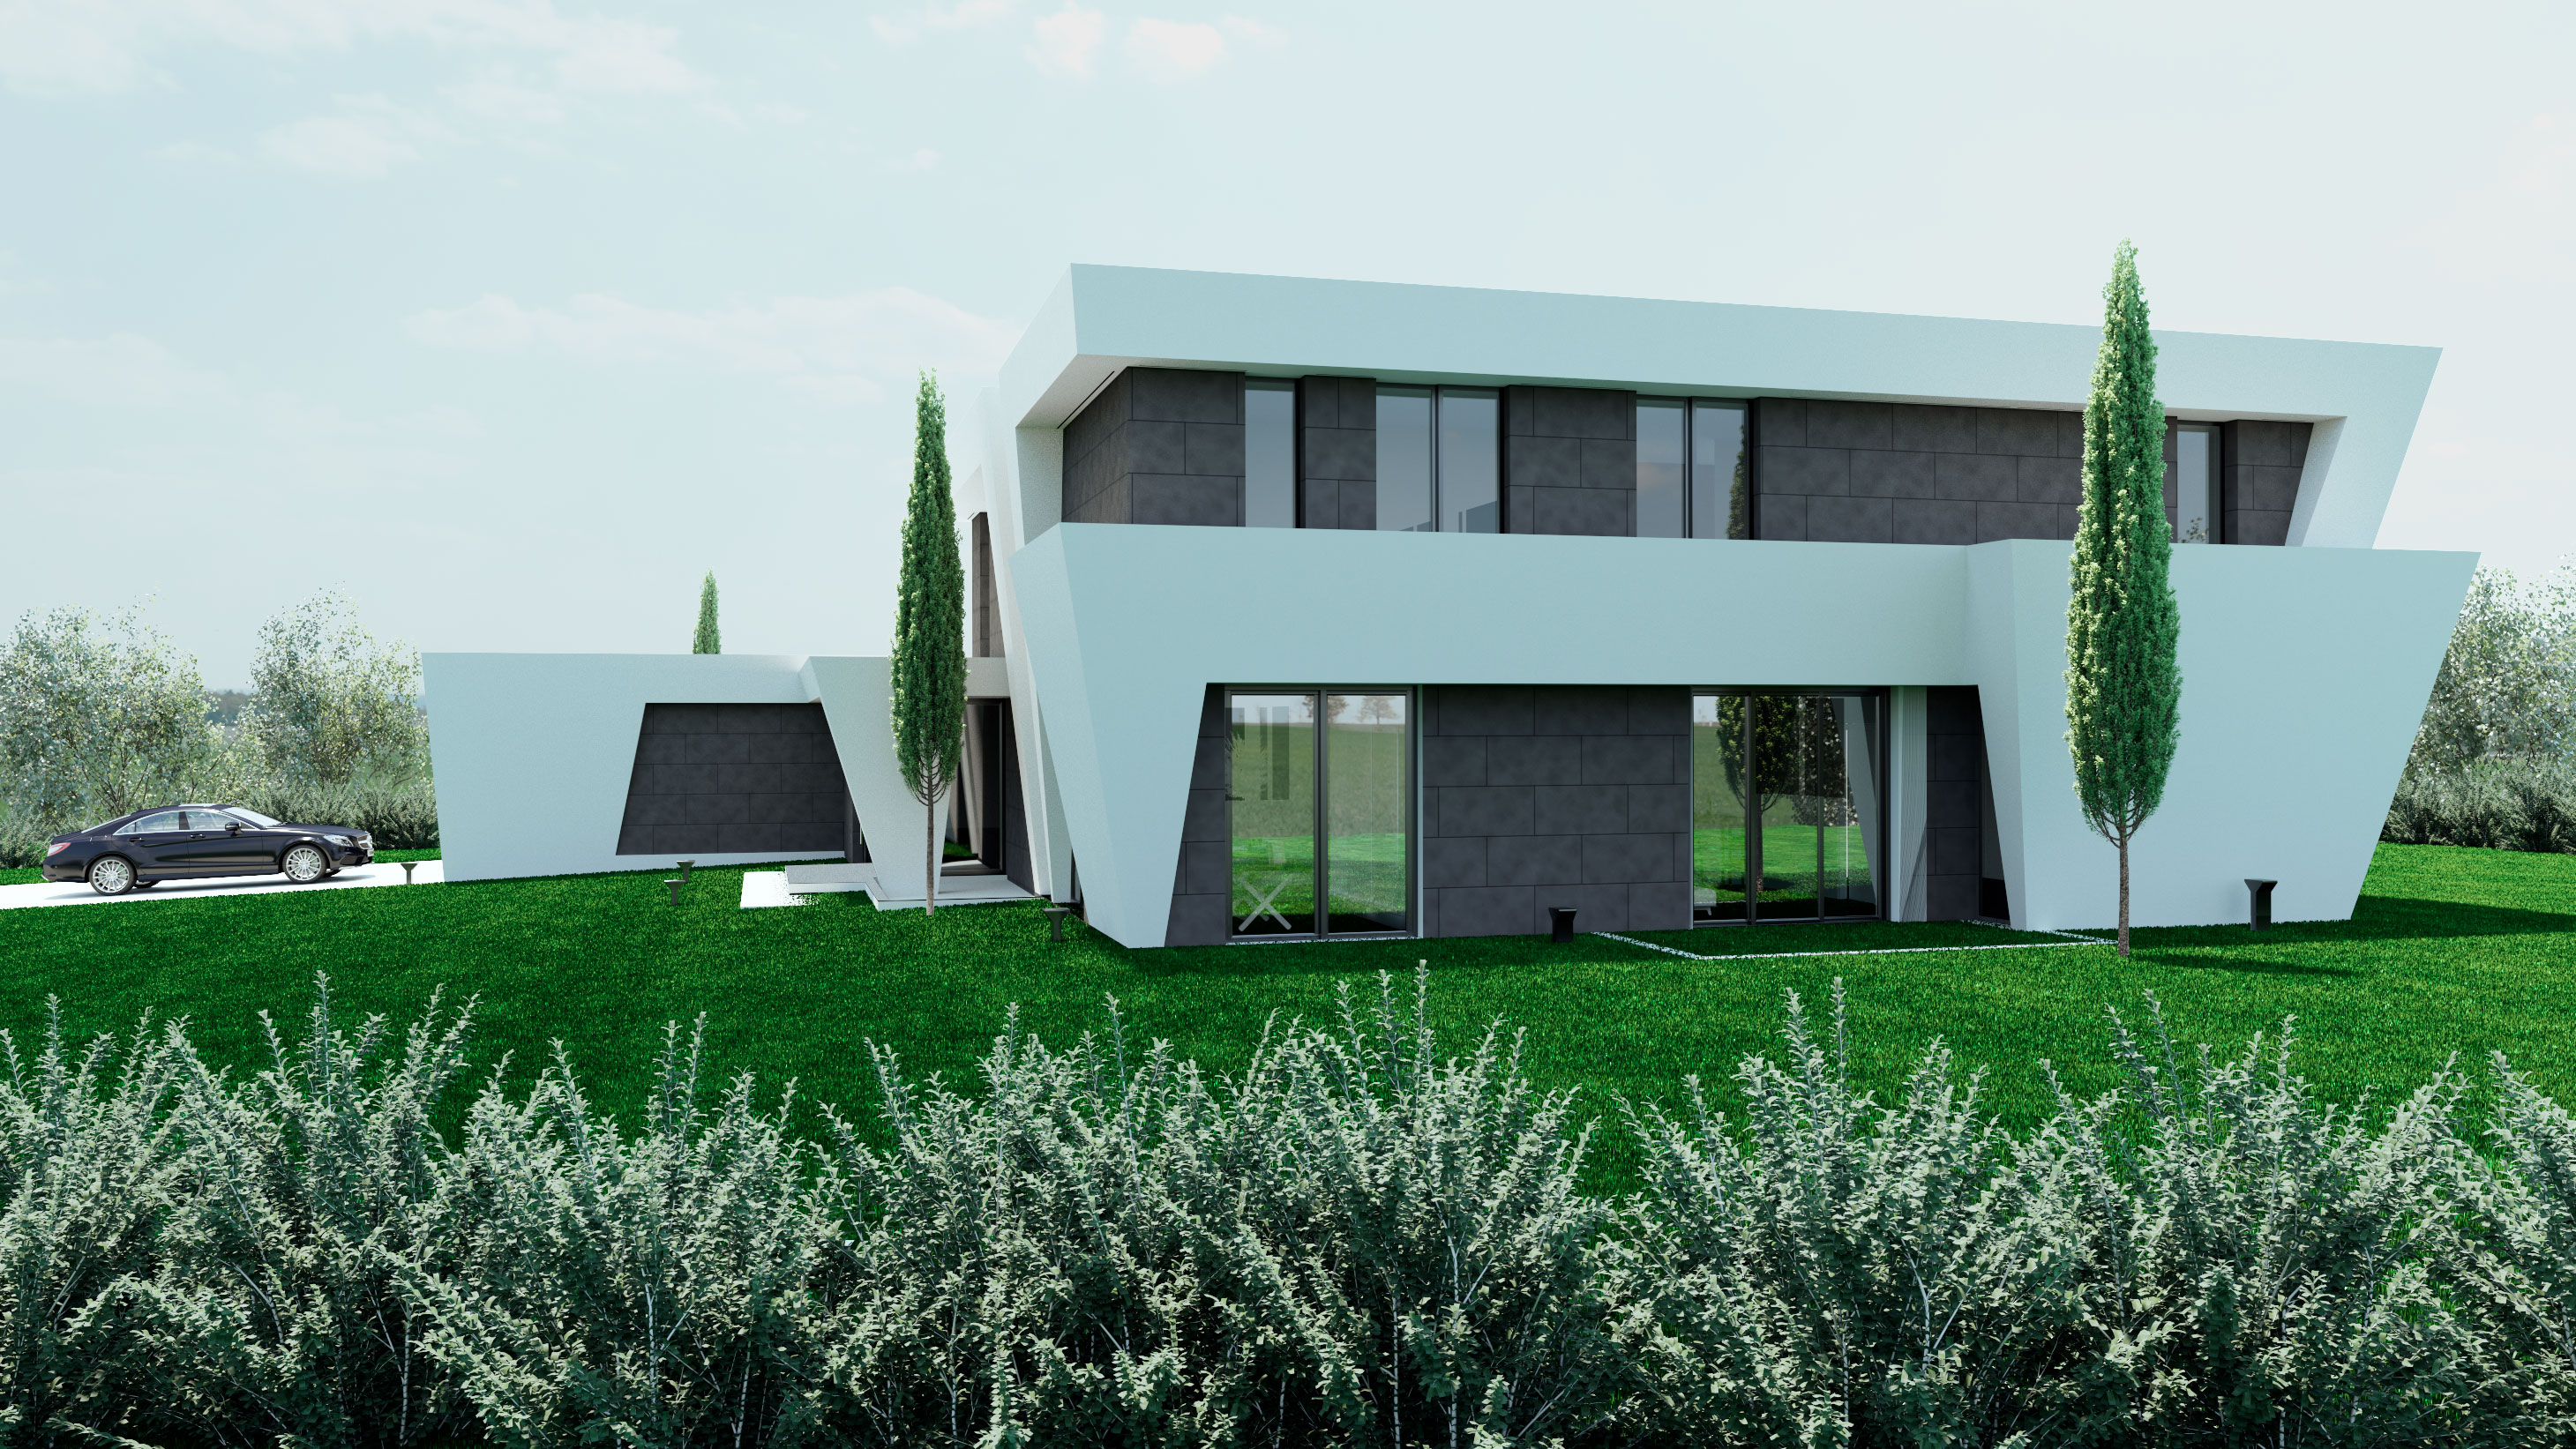 imágenes 3D arquitectura